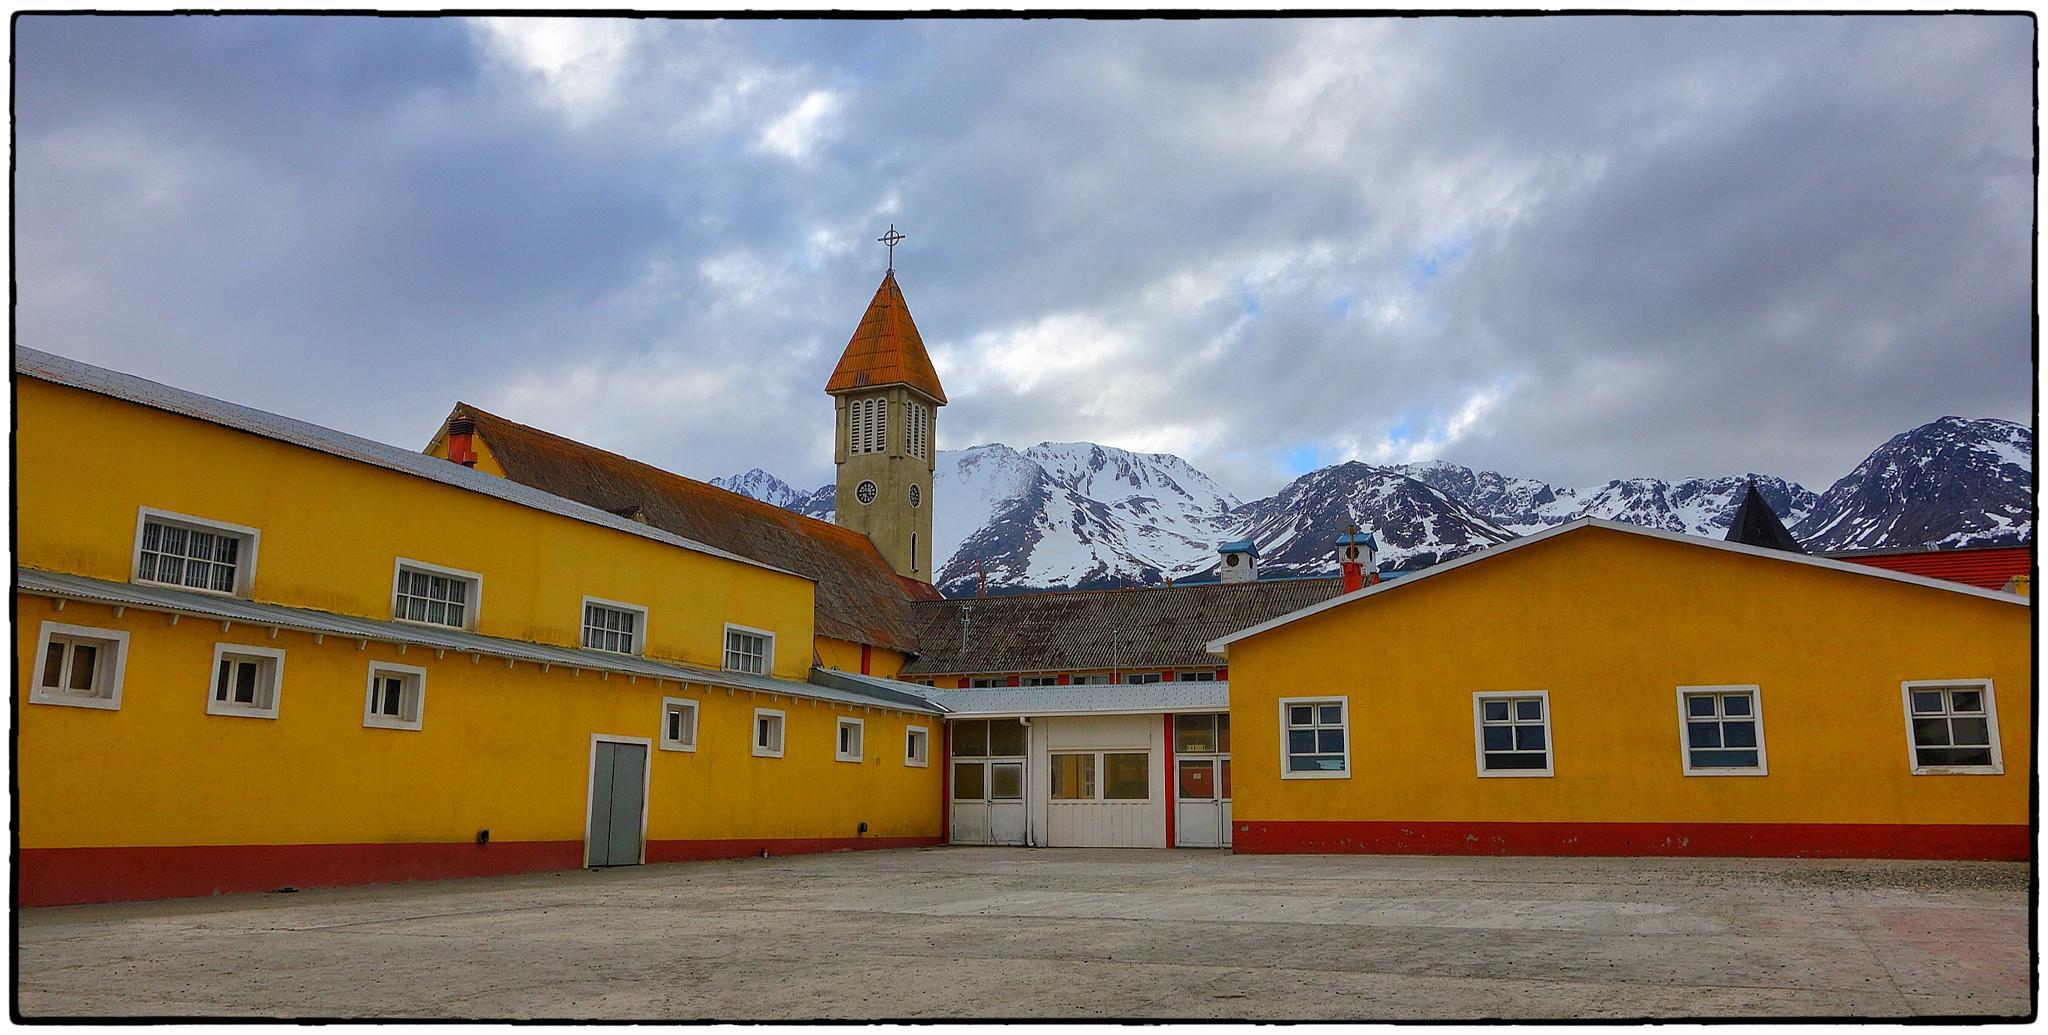 Escola a Ushuaia by bescosx